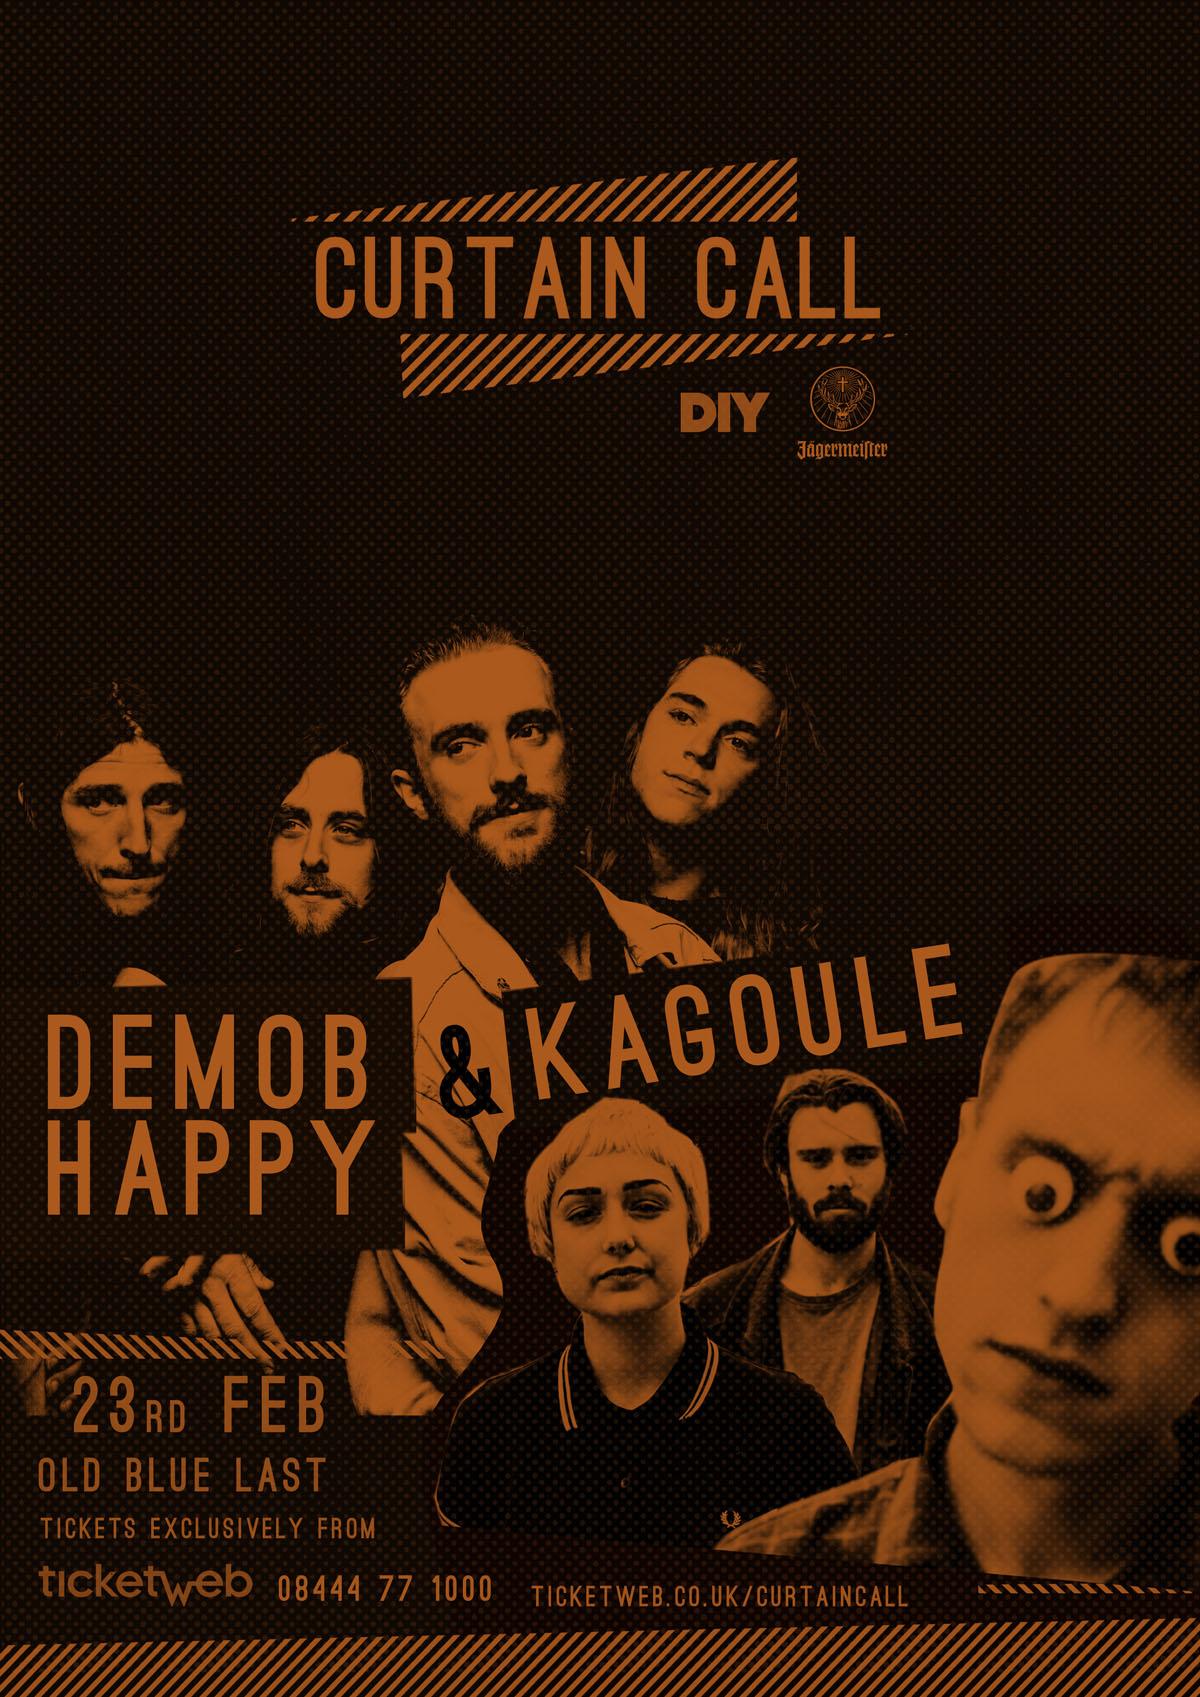 Demob Happy to join Kagoule for DIY & Jägermeister's Curtain Call